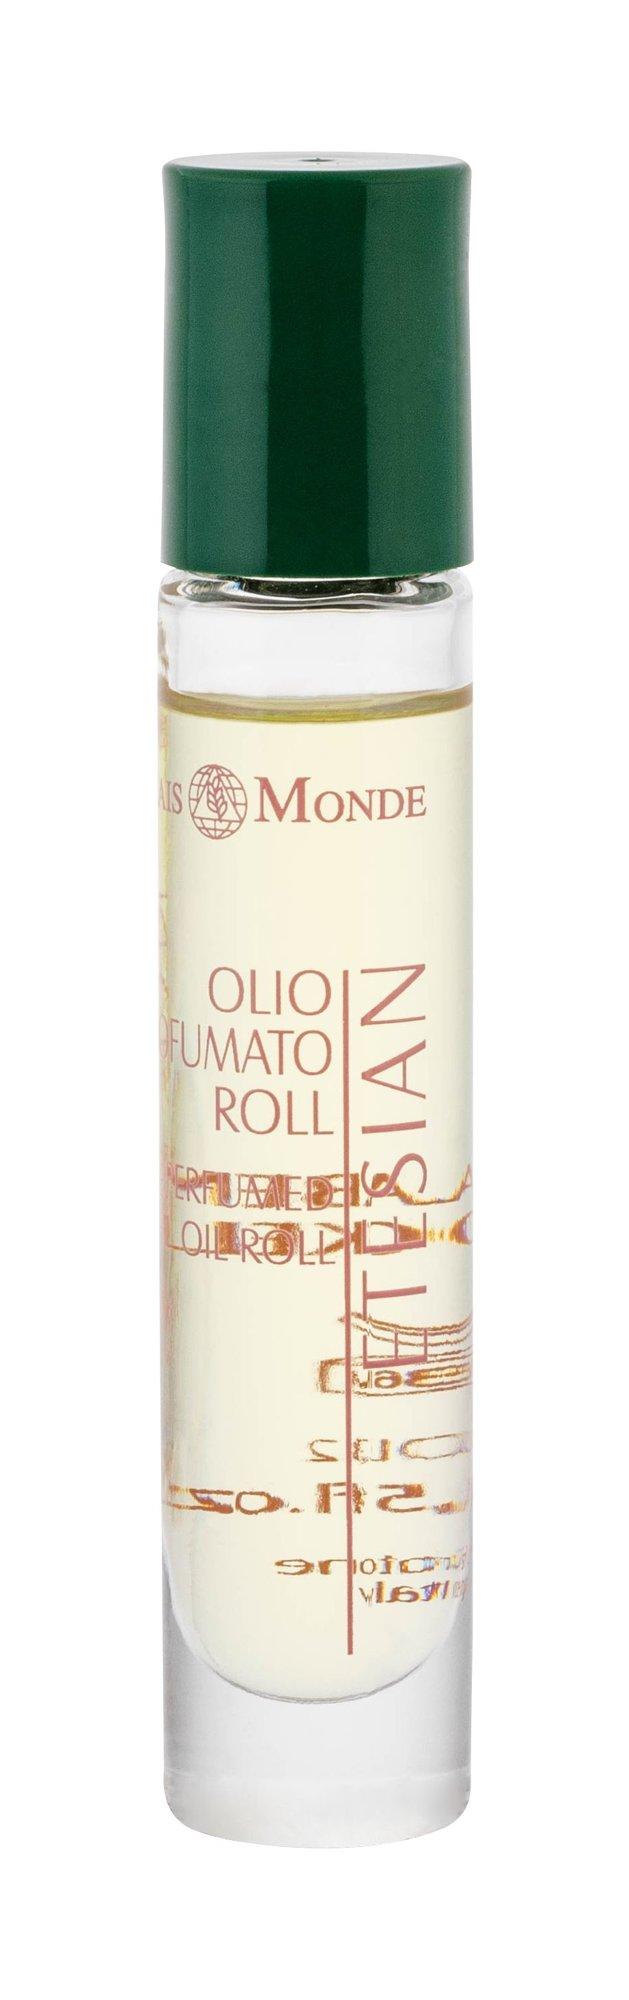 Frais Monde Etesian Perfumed Oil Roll Perfumed oil 15ml